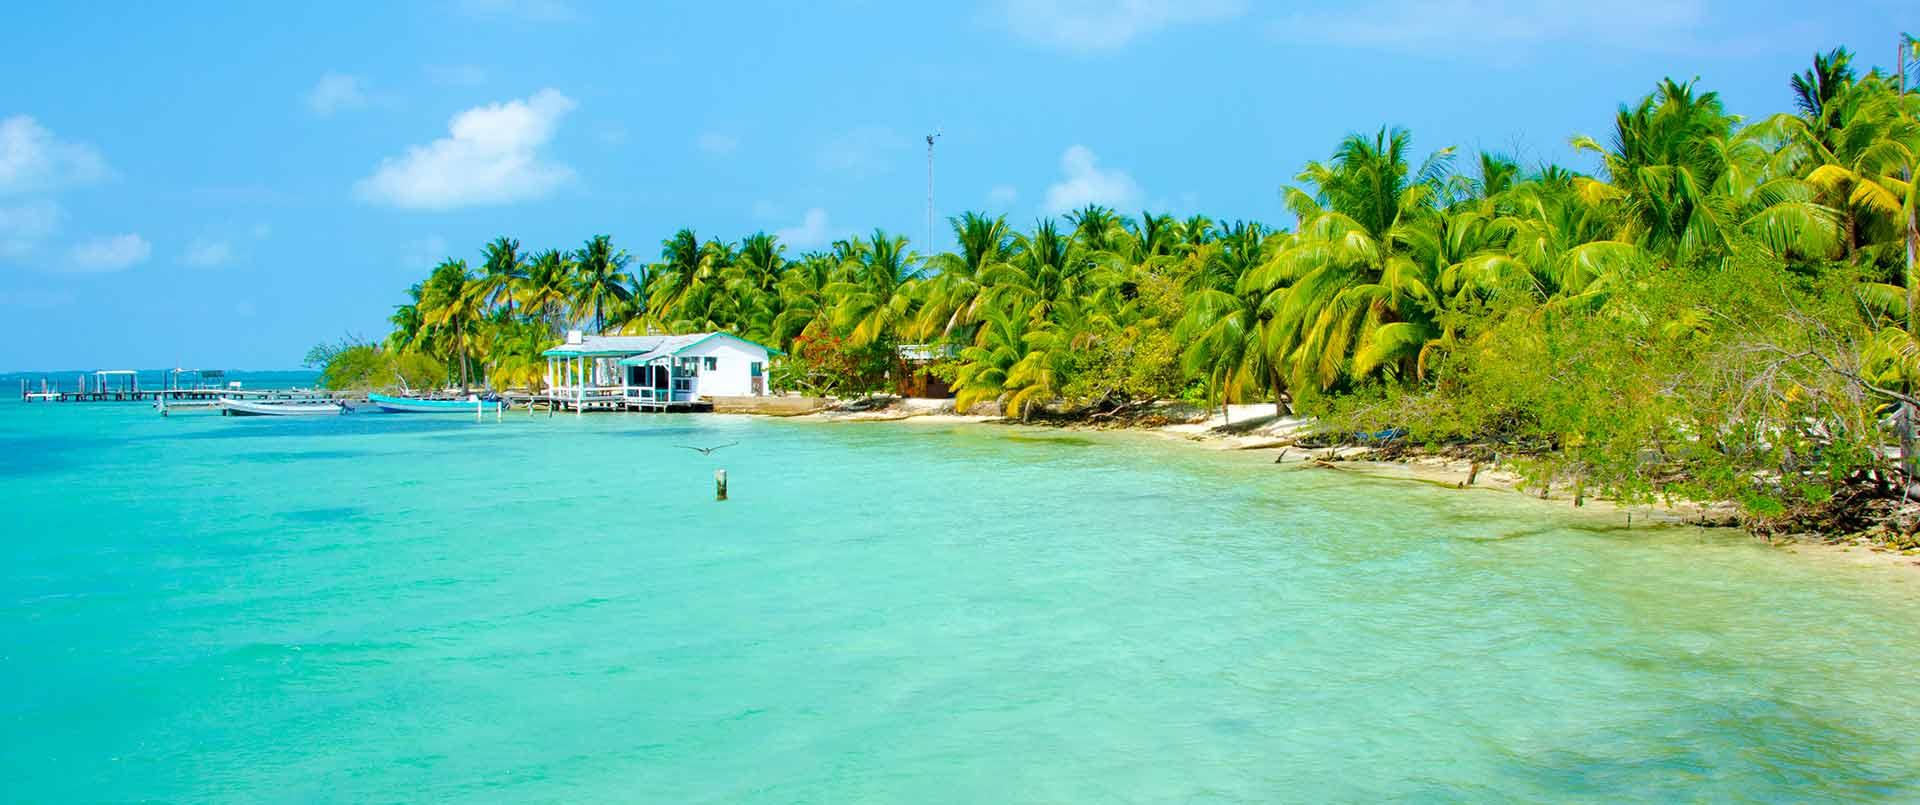 Honeymoon in Guatemala and Belize